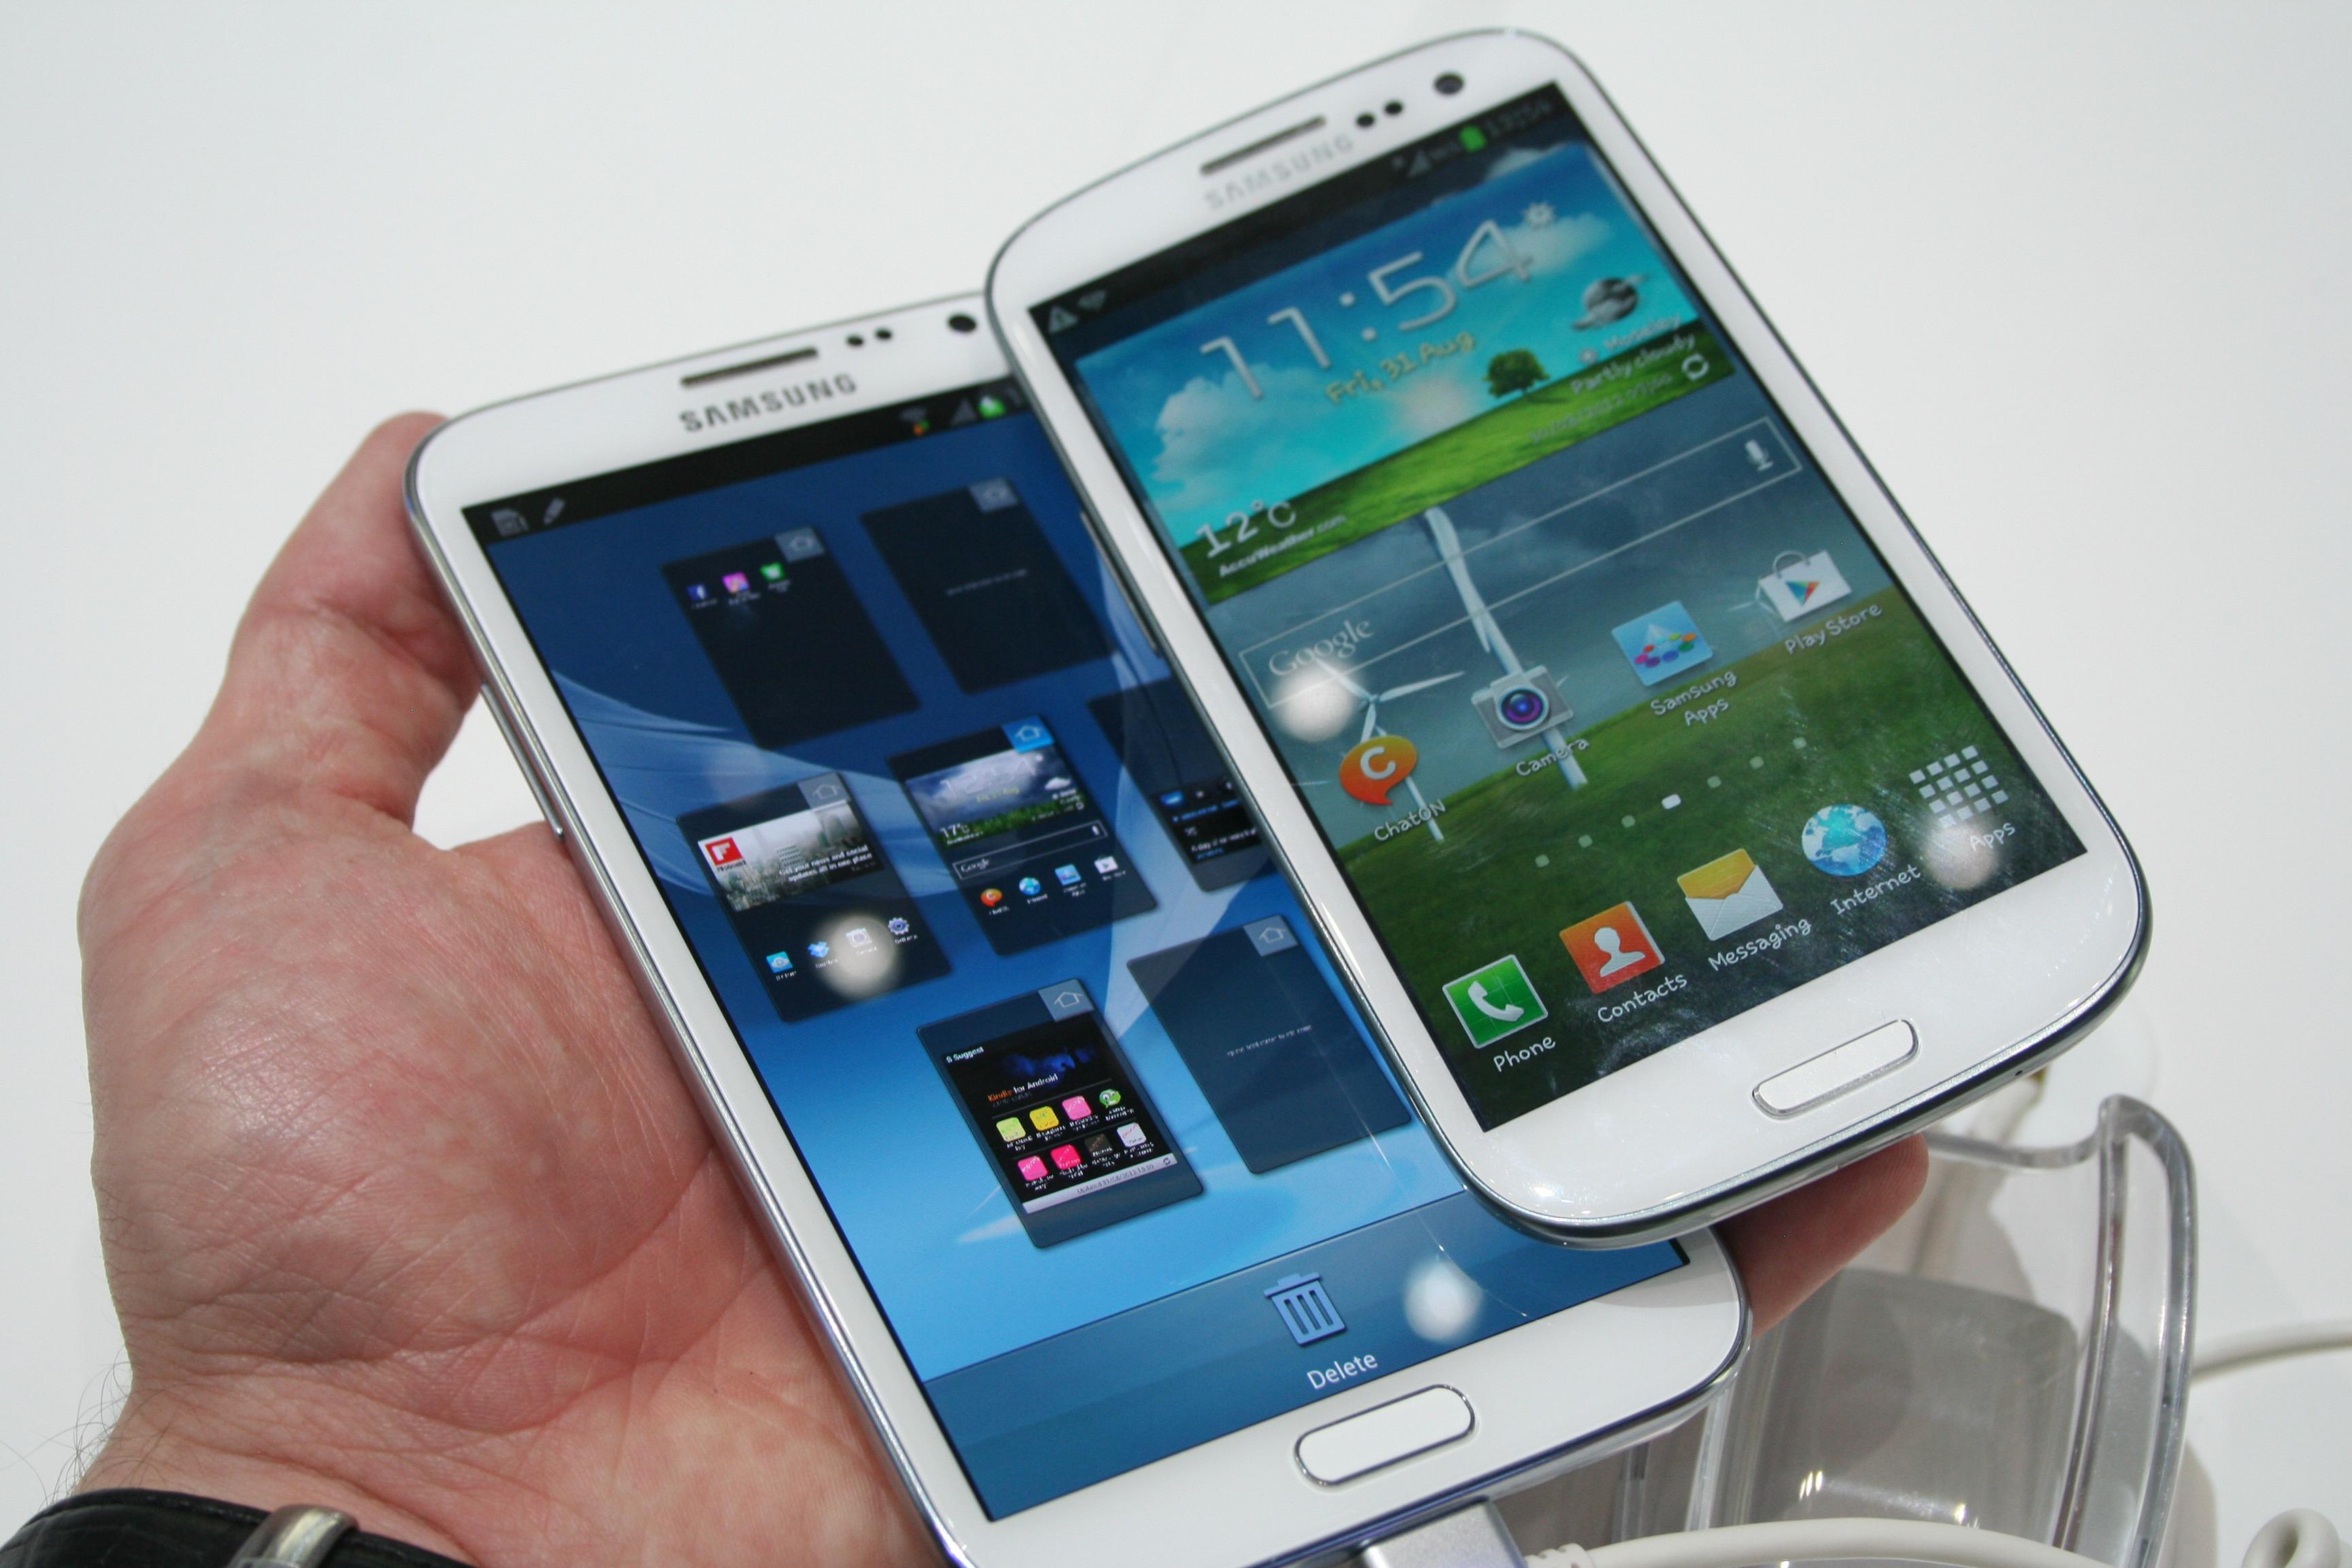 Samsung-Galaxy-Note-2-vs-S3-11